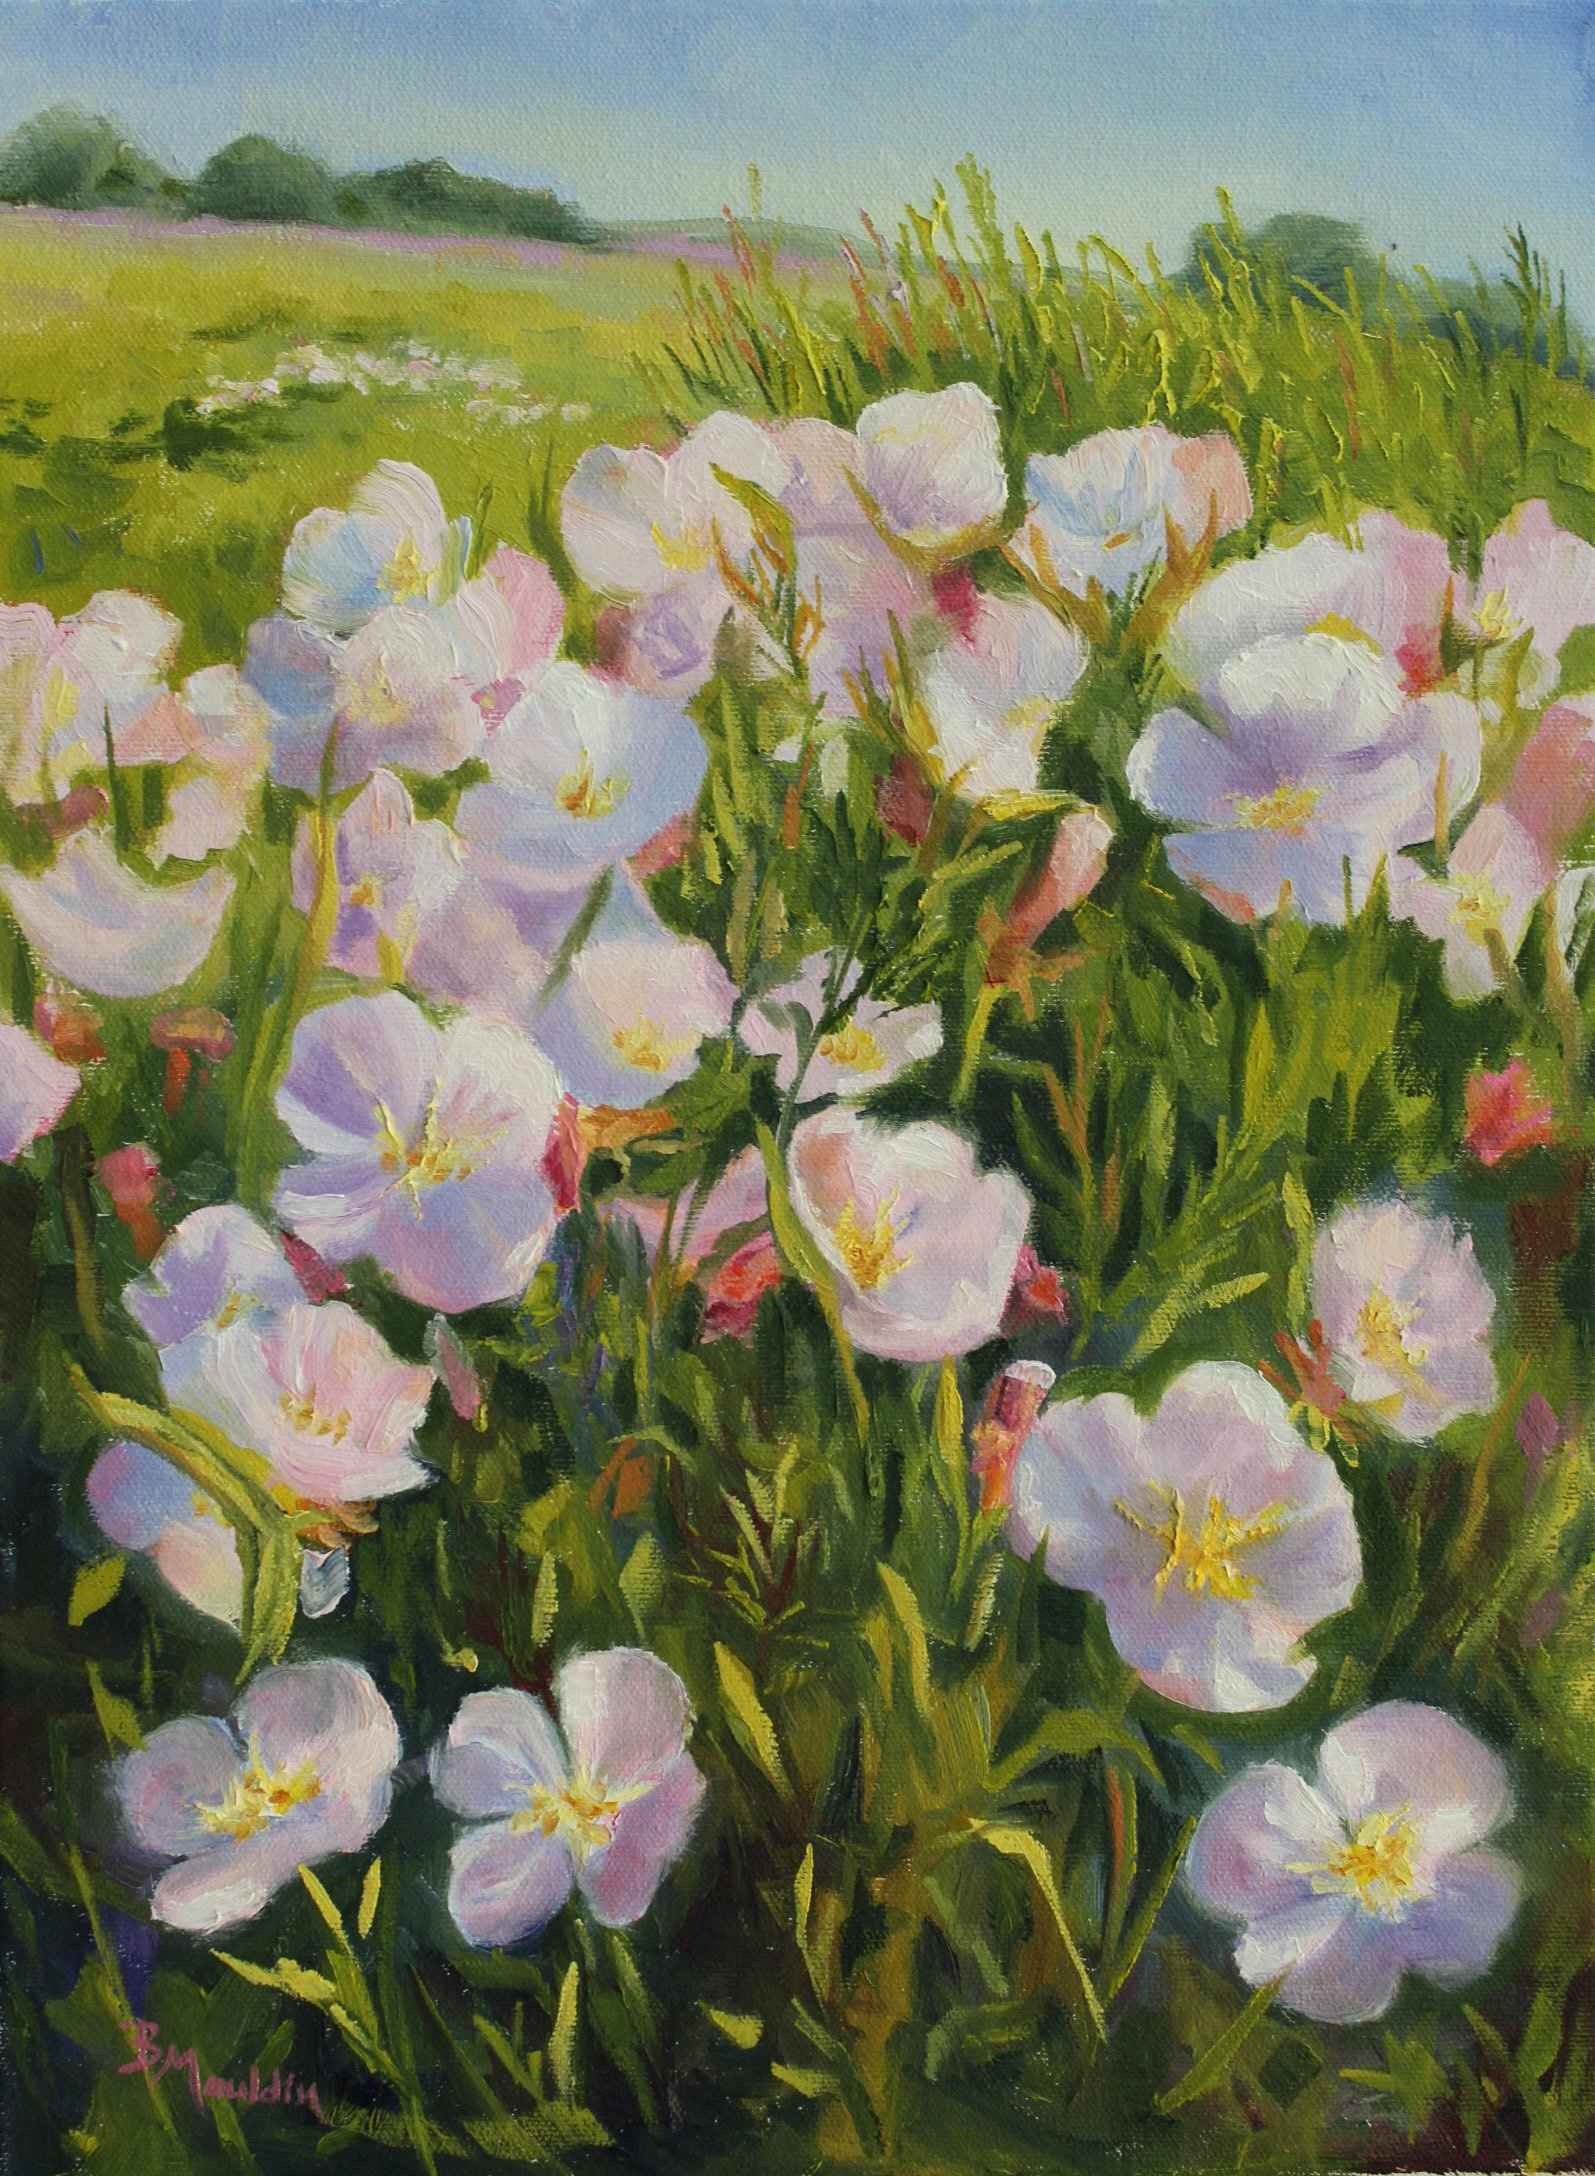 Tickled Pink by  Barbara Mauldin - Masterpiece Online